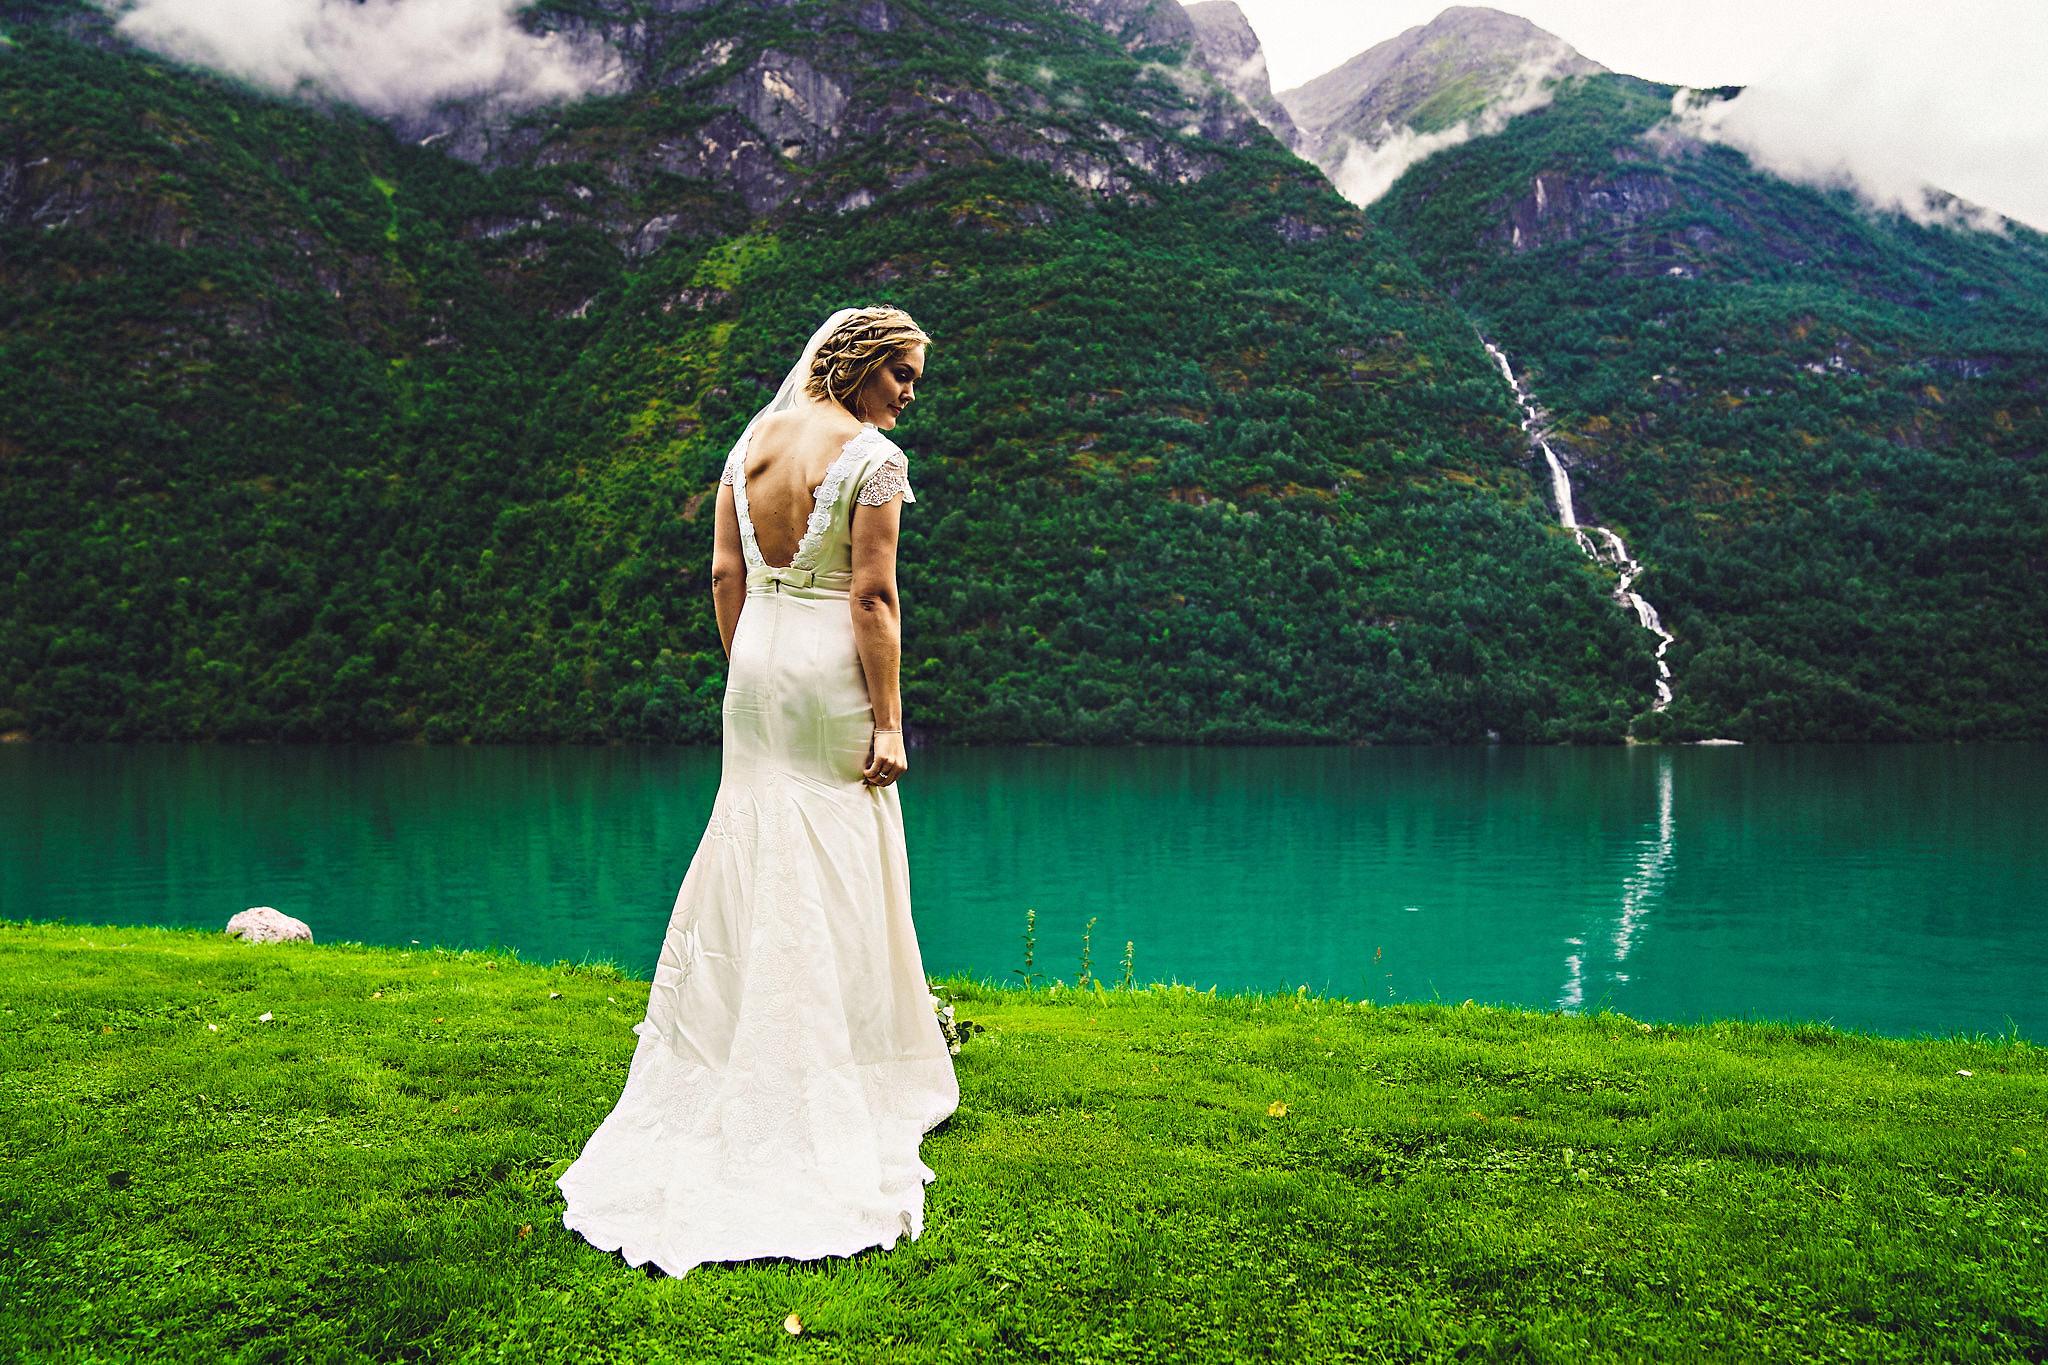 Bryllup på Yrineset i Oldedalen bryllupsfotograf sogn og fjordane-39.jpg